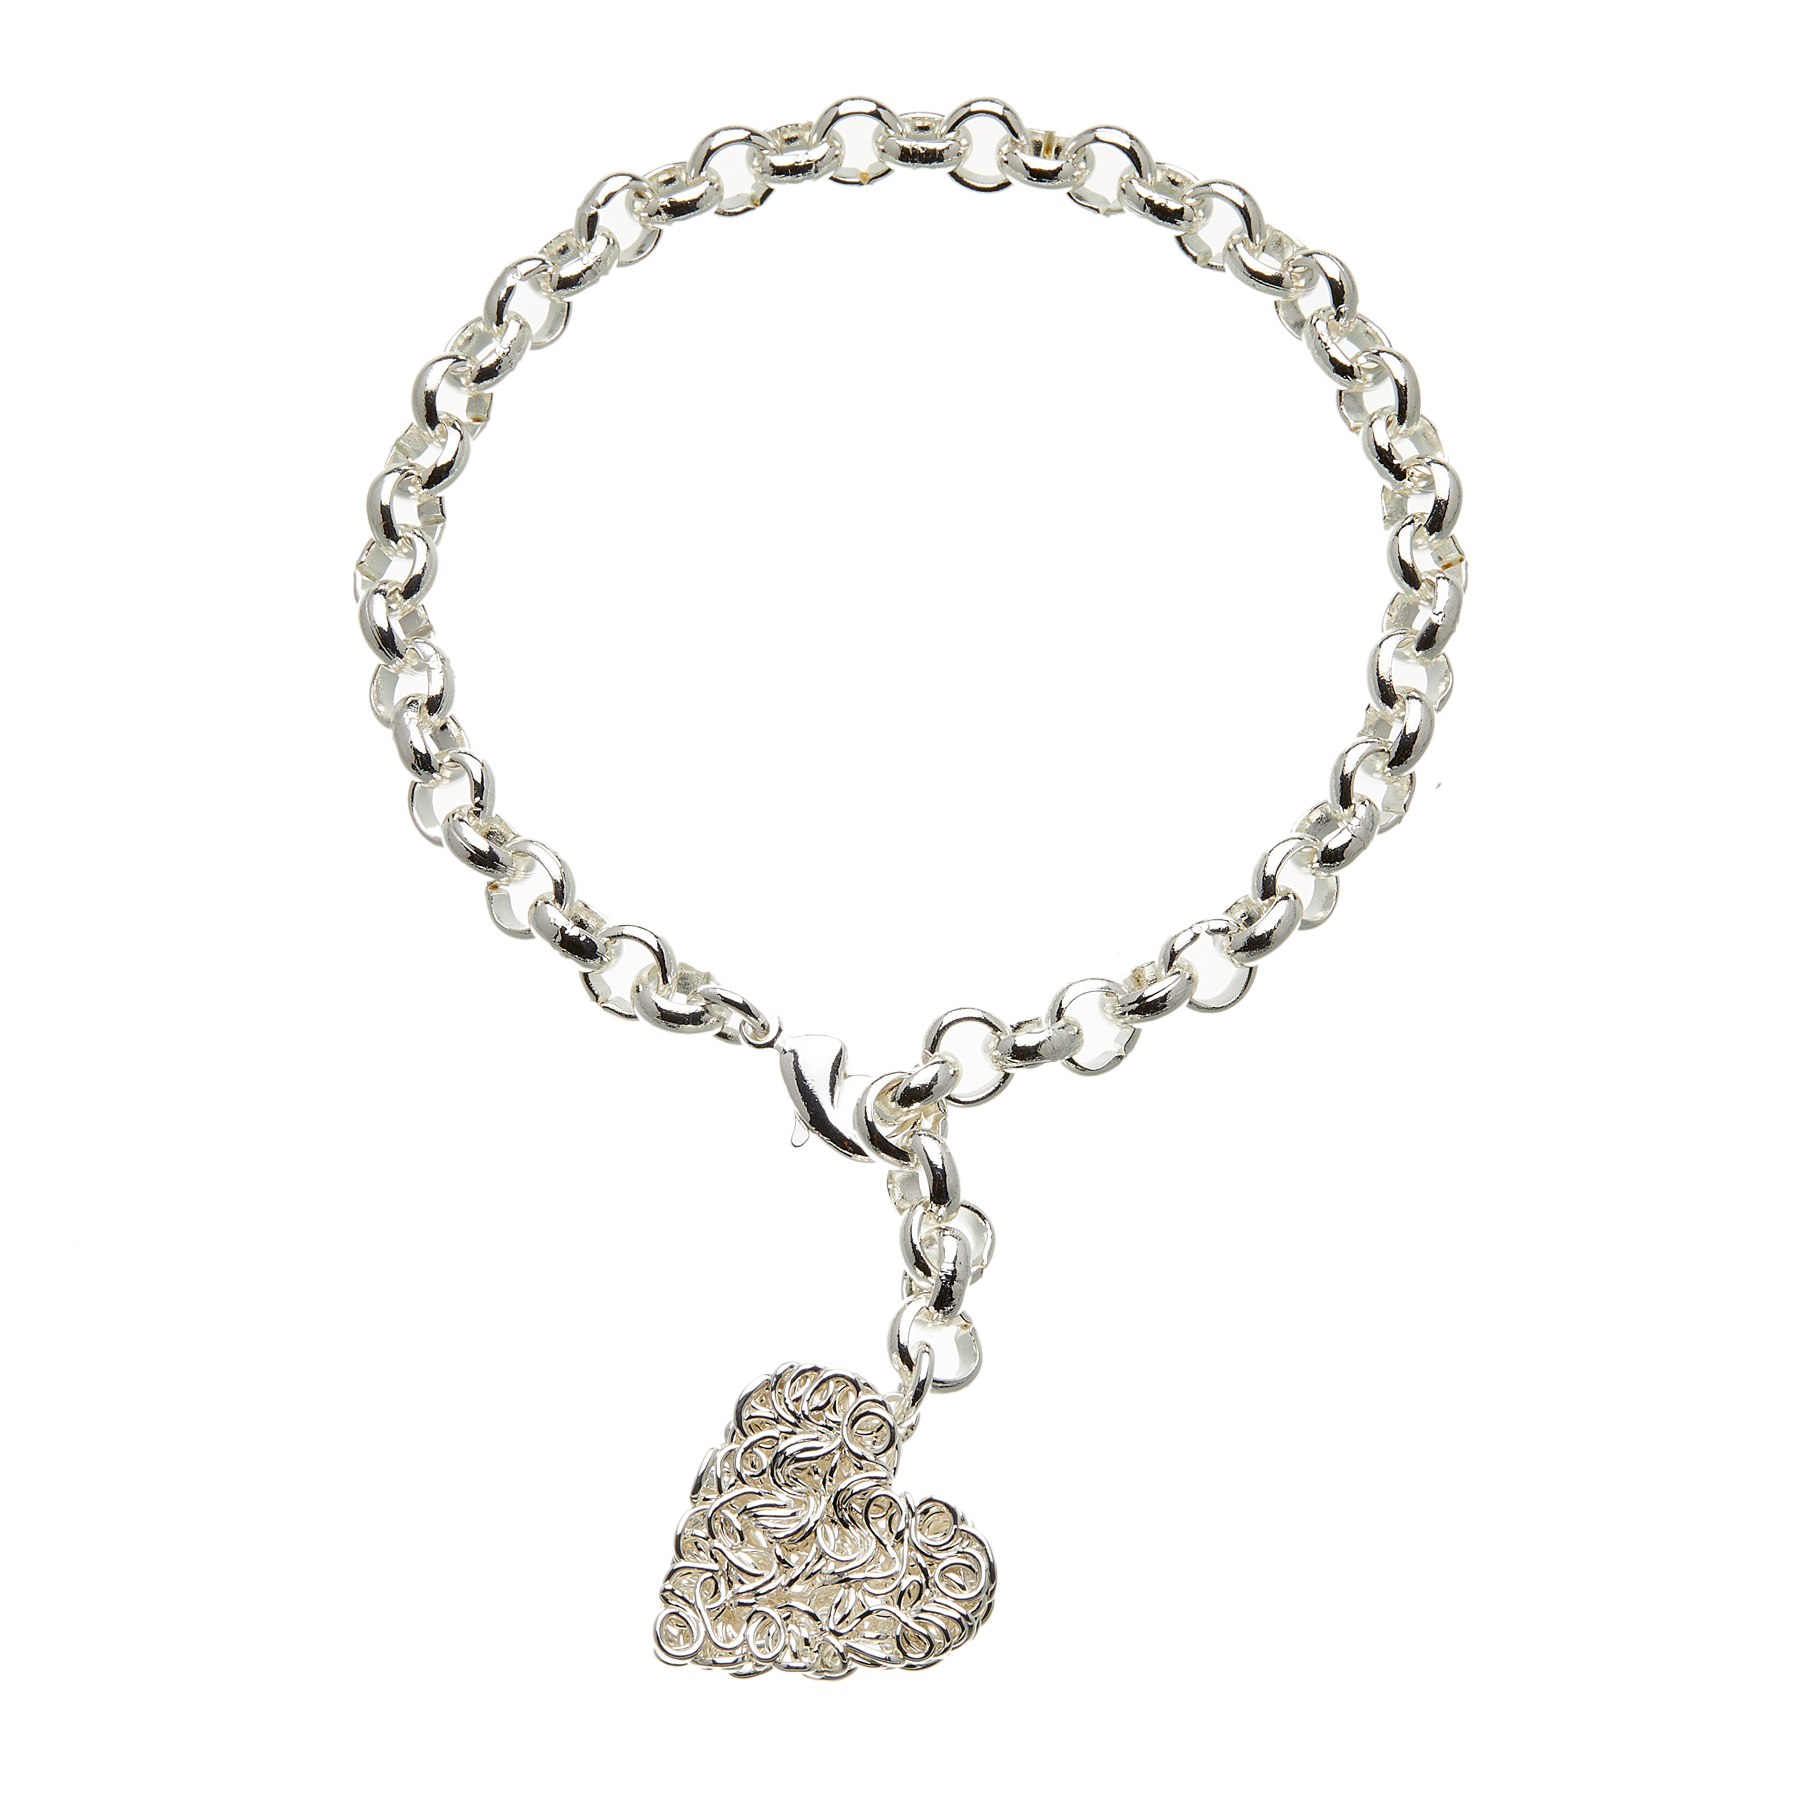 Silver heart tag charm Bracelet - Rowan S